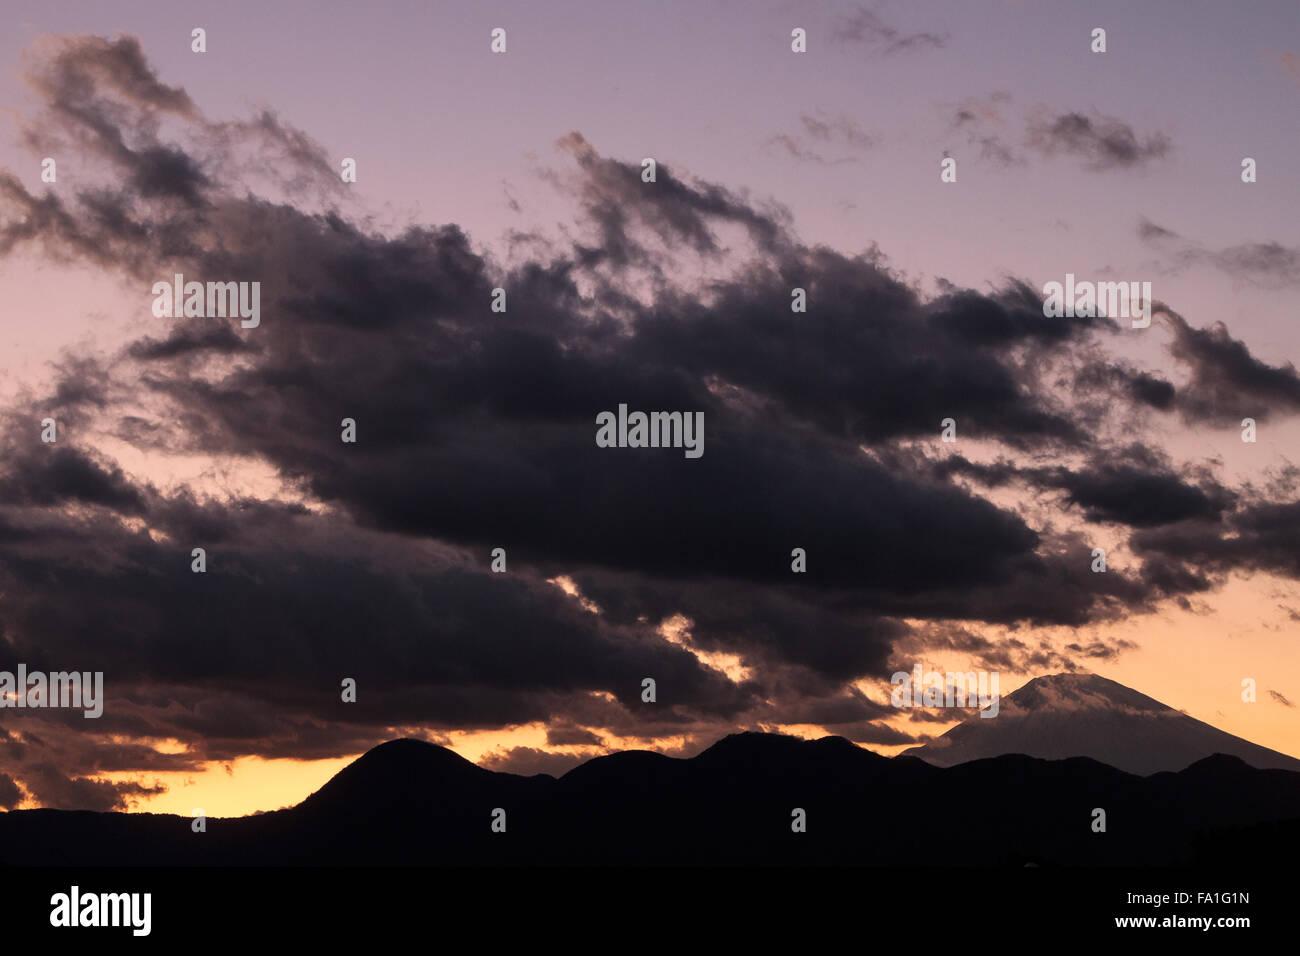 Mount Fuji at sunset, Japan. Saturday December 19th 2015 - Stock Image